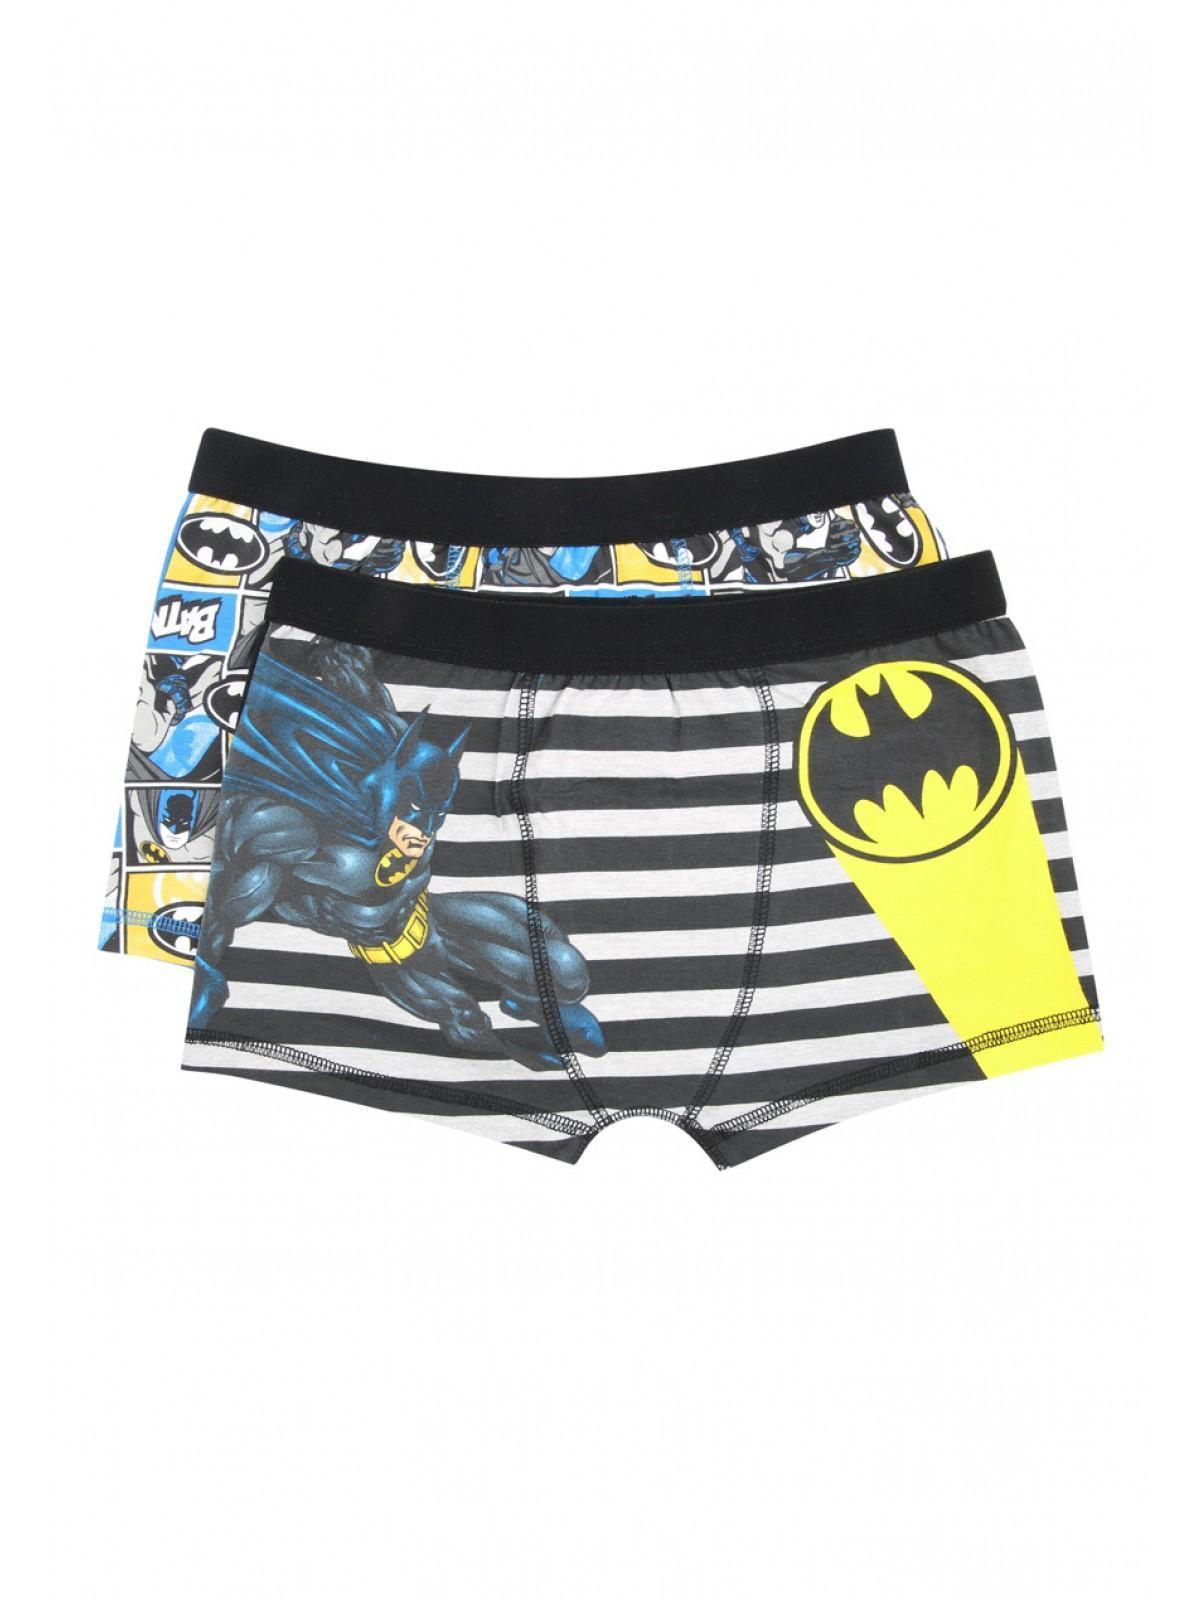 79e3a86898 Home; Boys 2pk Batman Trunks. Back. PreviousNext